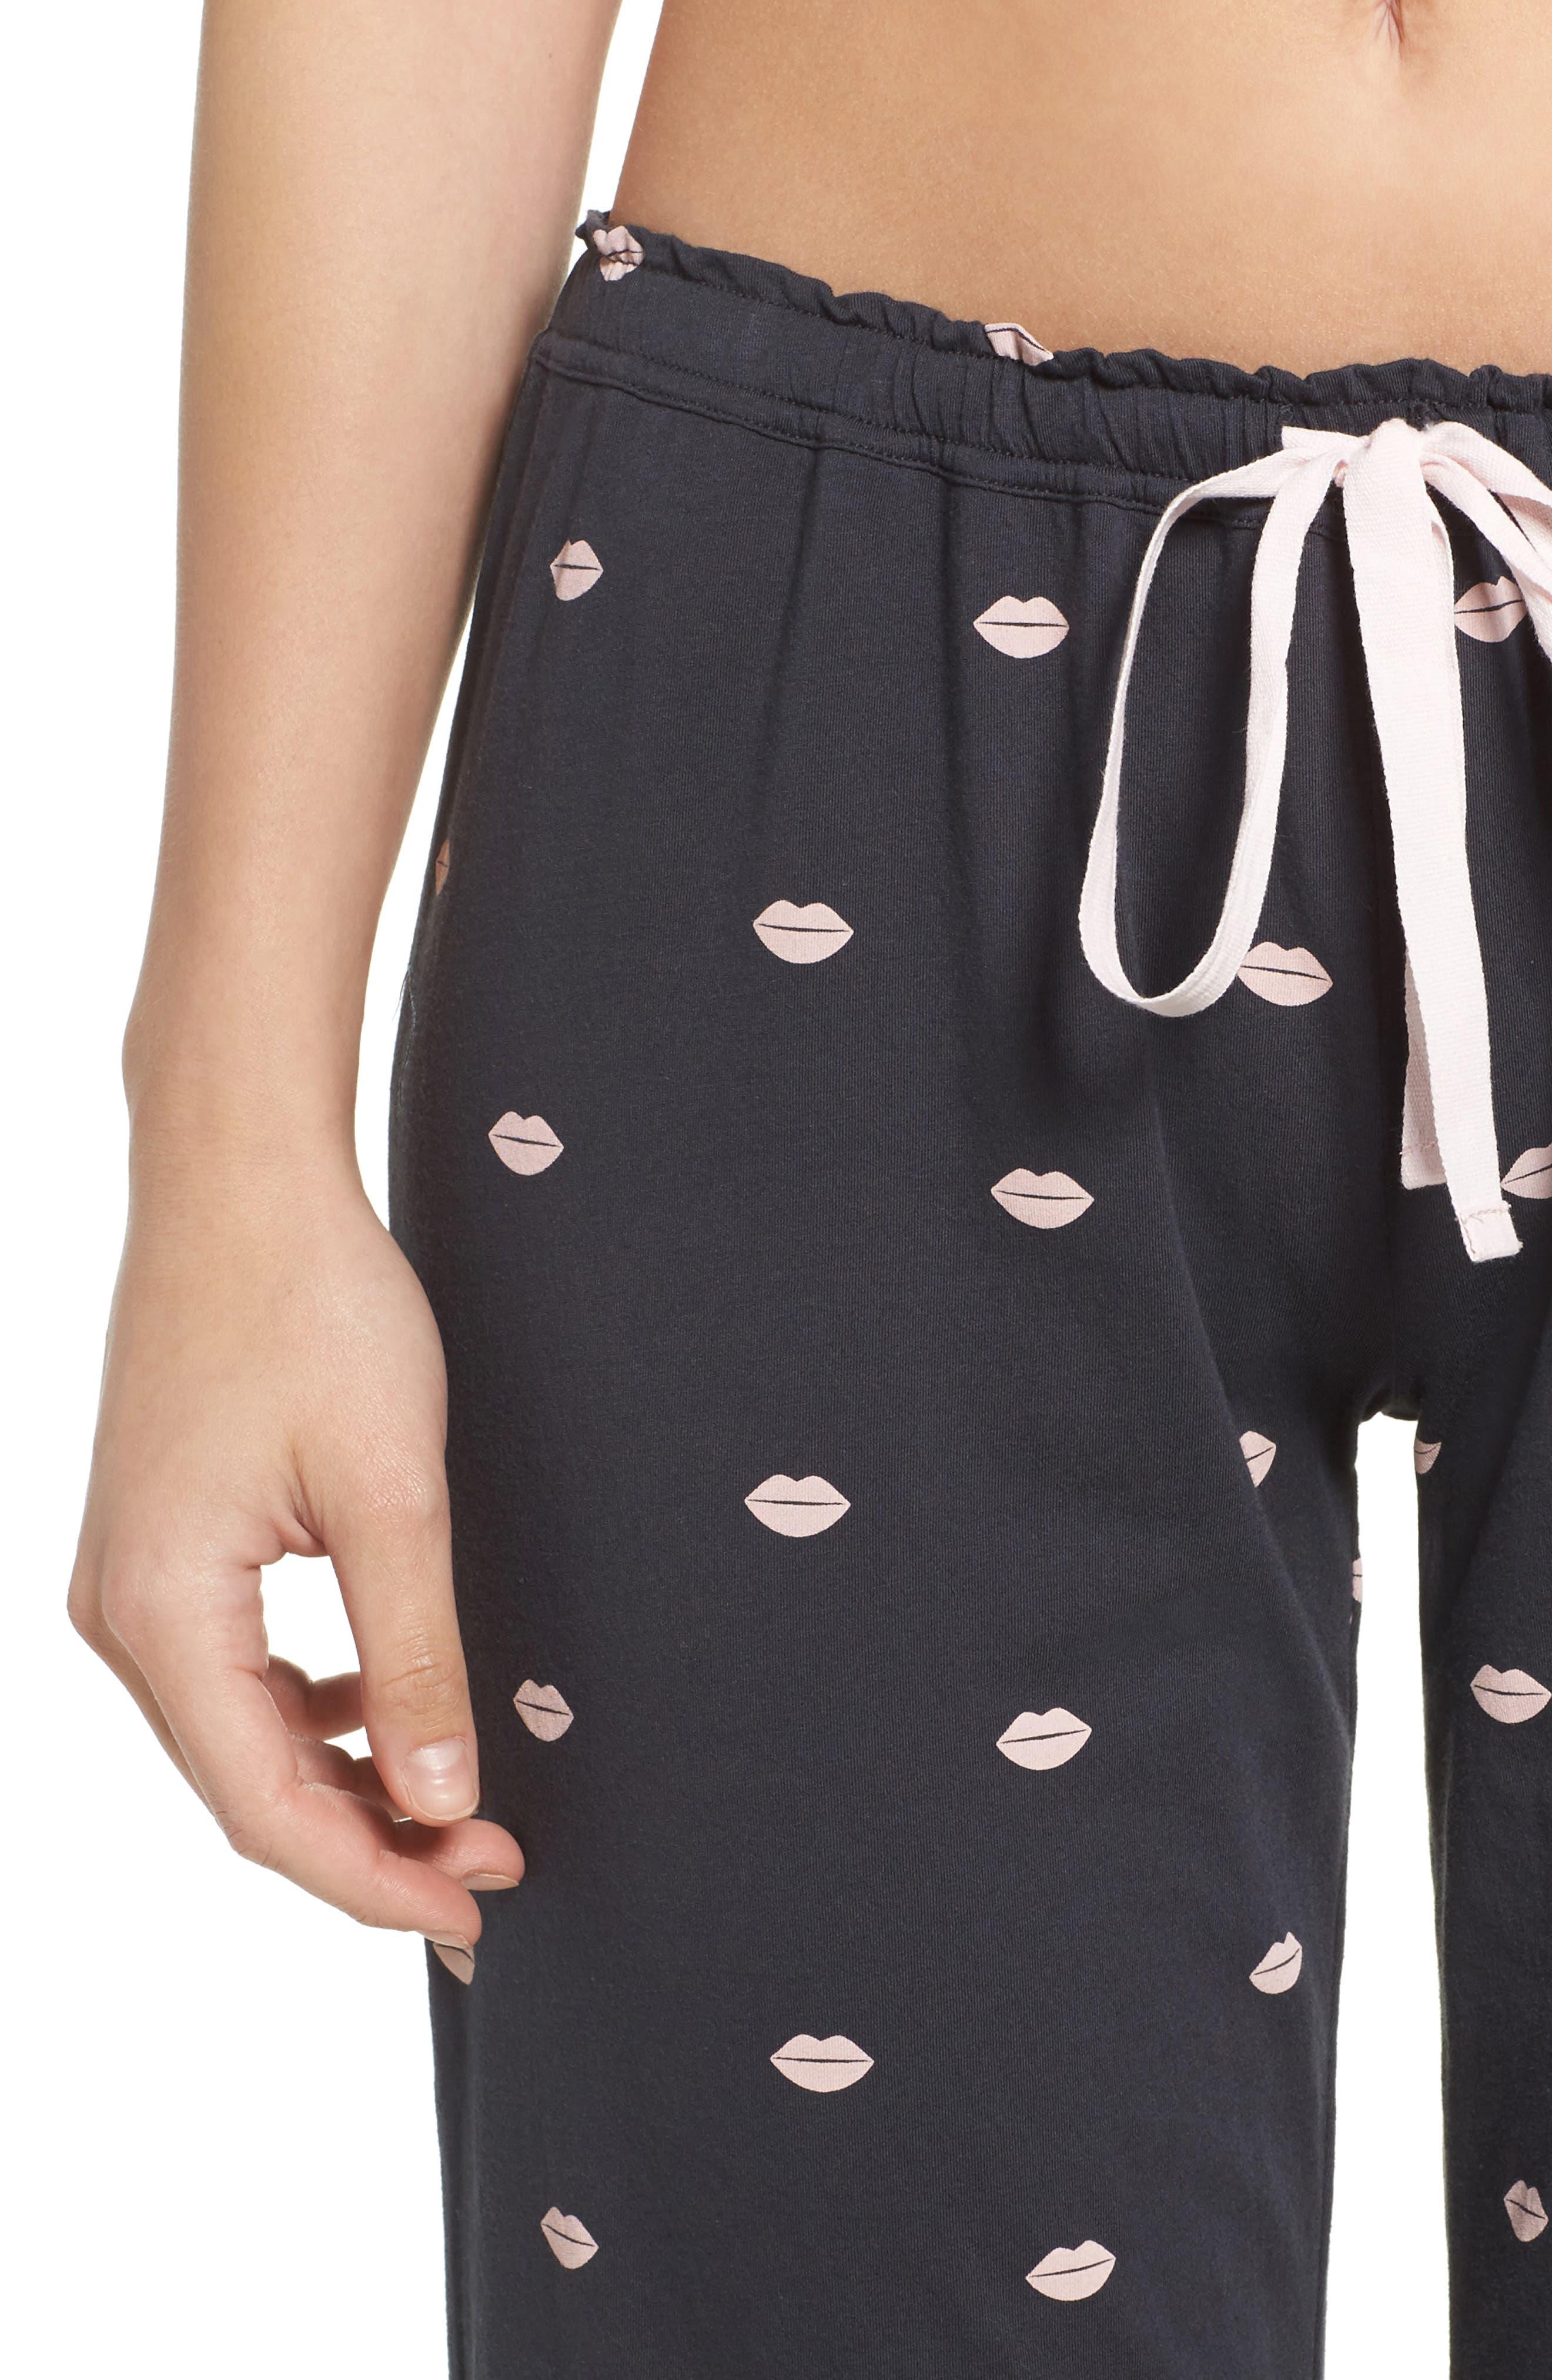 Lip Print Pajama Pants,                             Alternate thumbnail 4, color,                             030